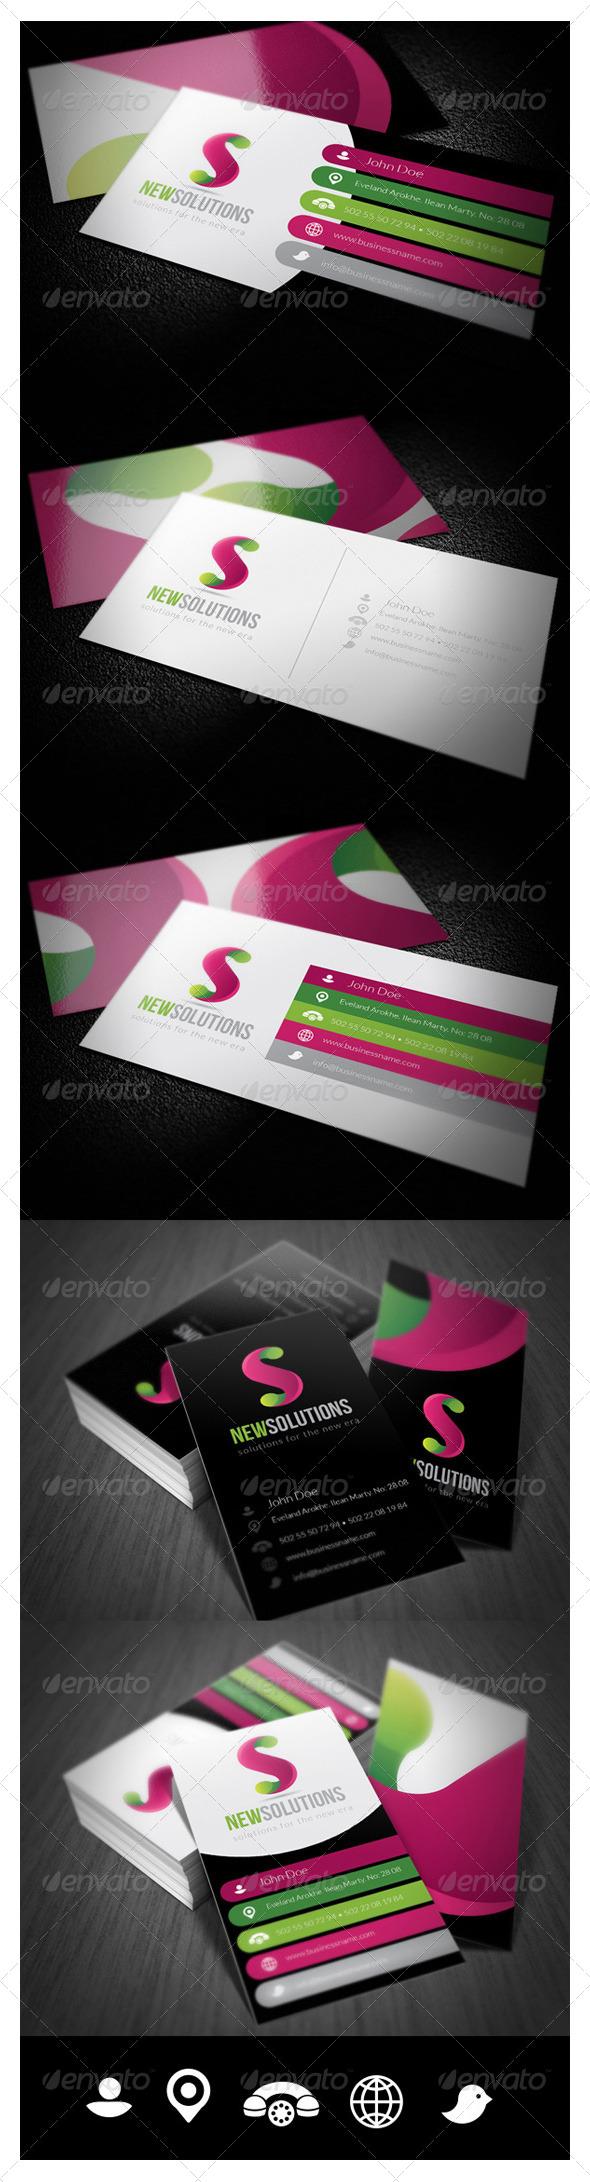 5 Flat Business Card 001